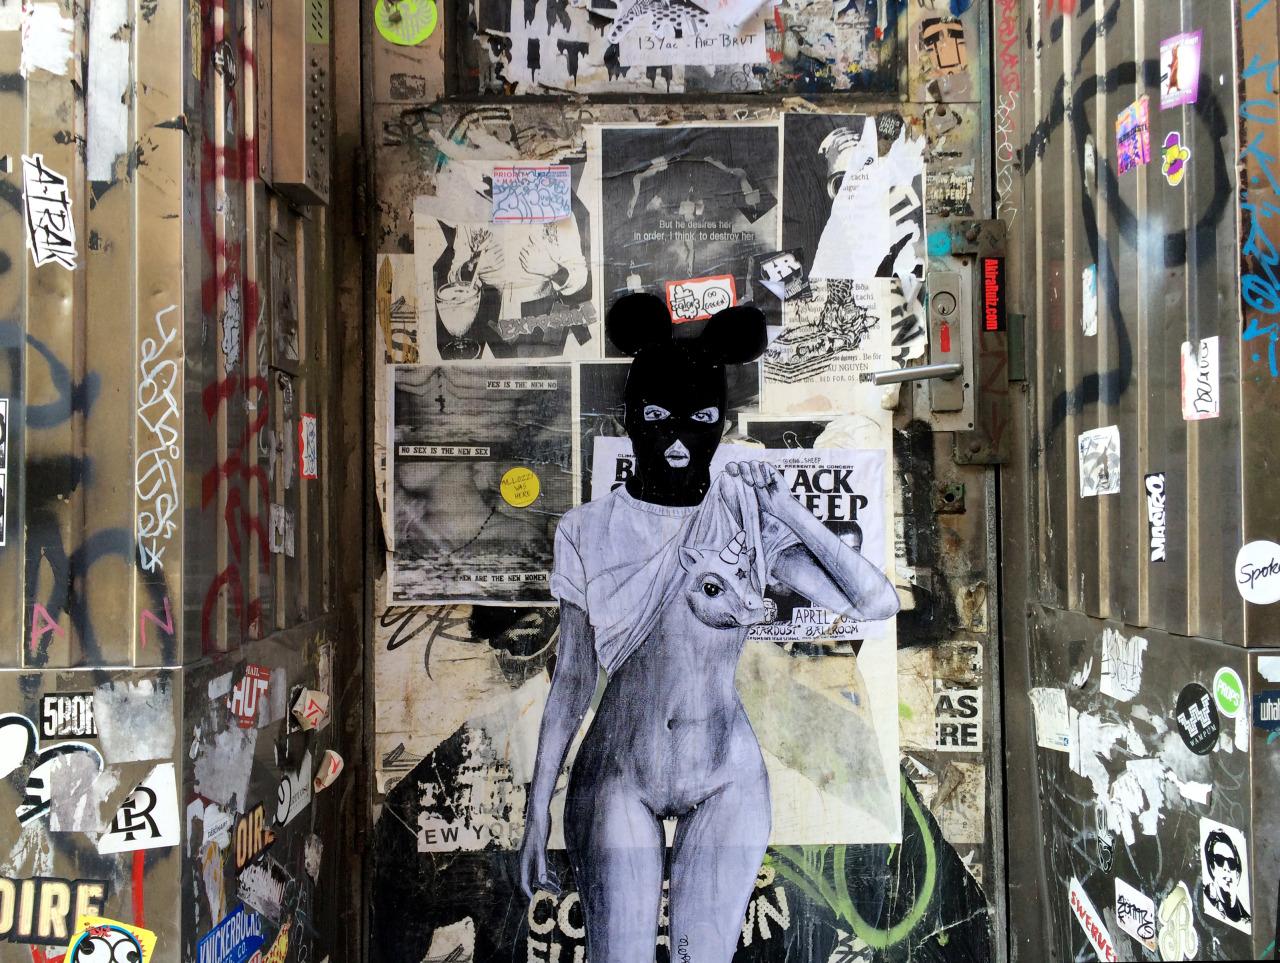 MissMe - The Artful Vandal